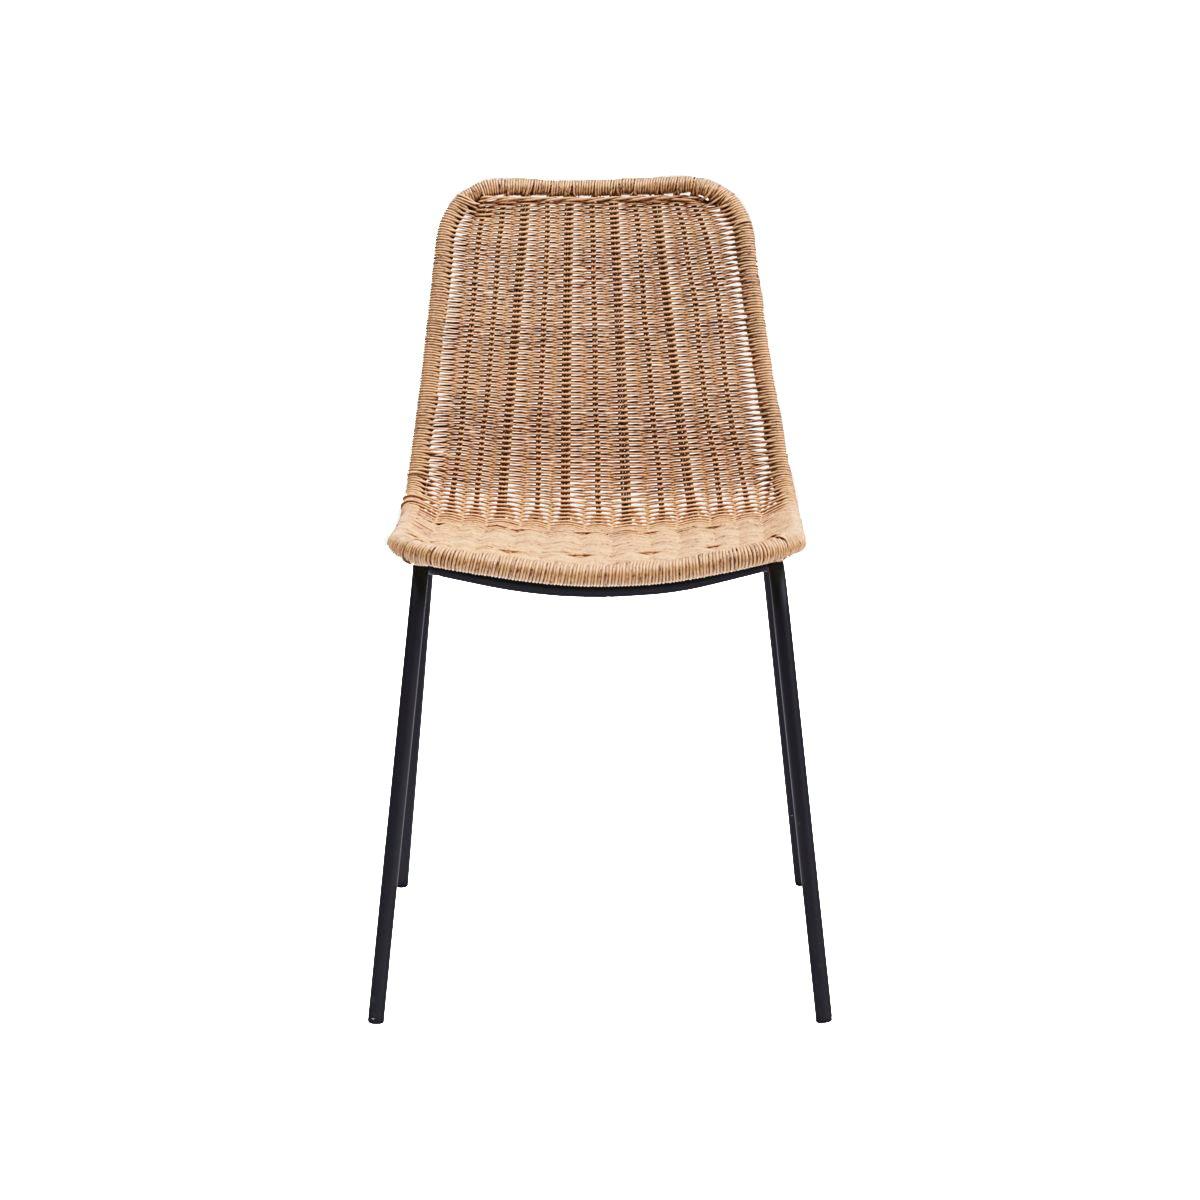 House Doctor - Hapur Chair - Natur (210940300)